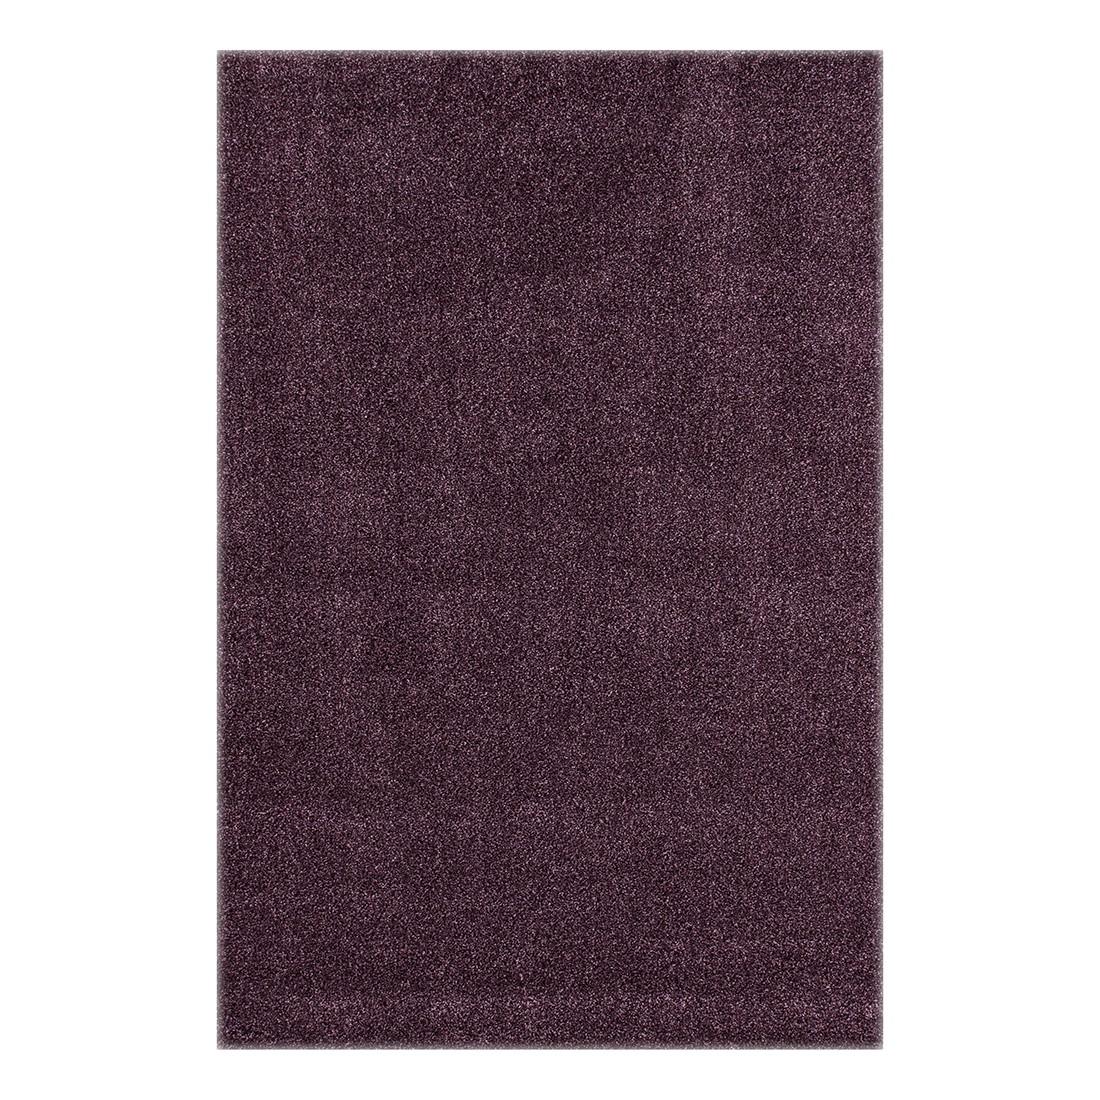 teppich basic lila 200 x 290 cm obsession g nstig kaufen. Black Bedroom Furniture Sets. Home Design Ideas